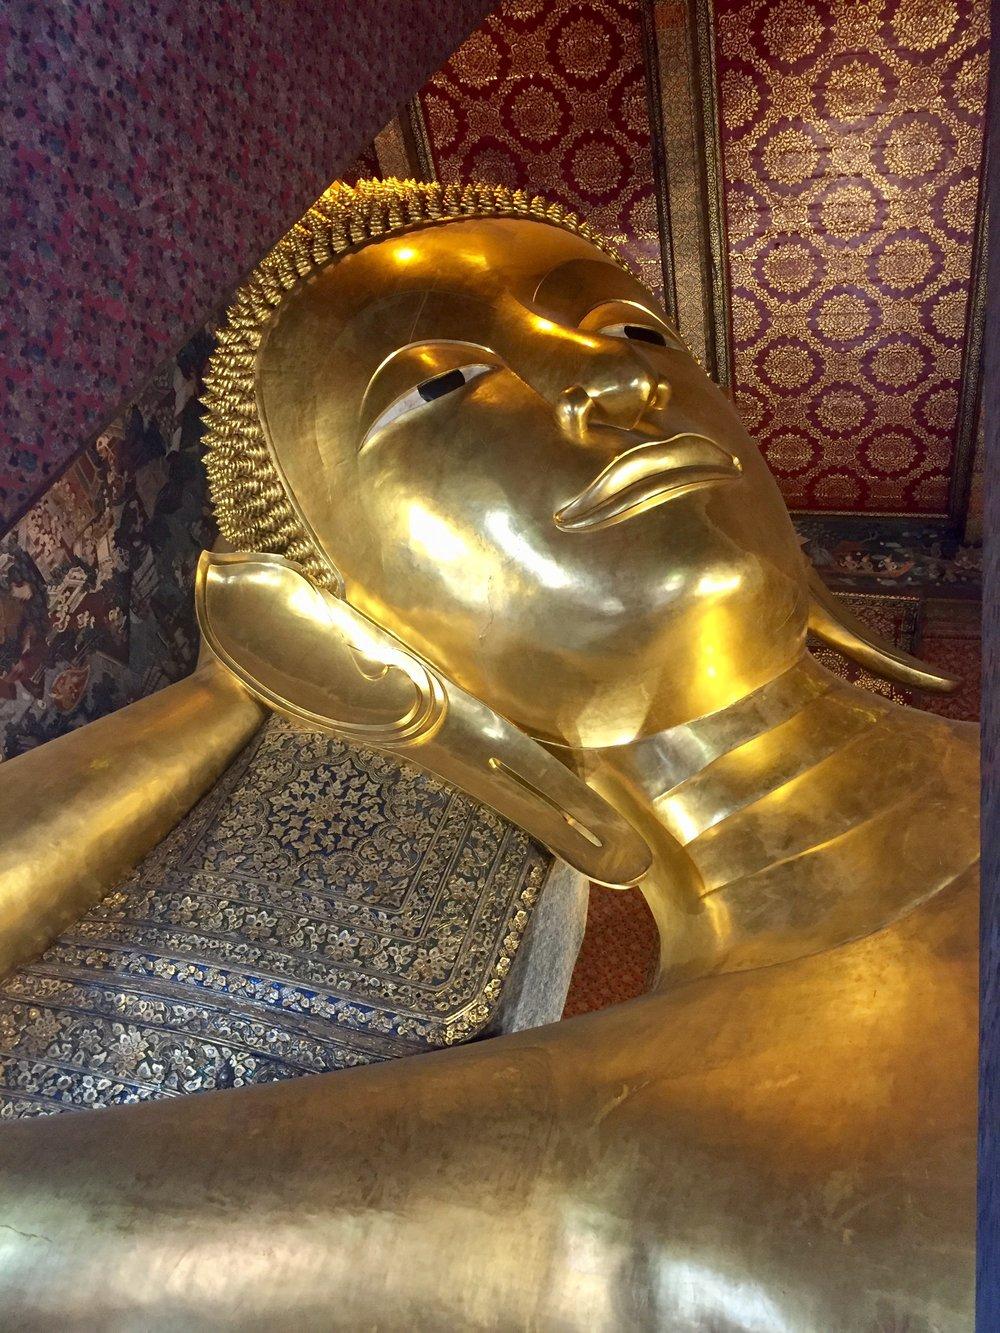 The Reclining Buddha in Wat Pho.